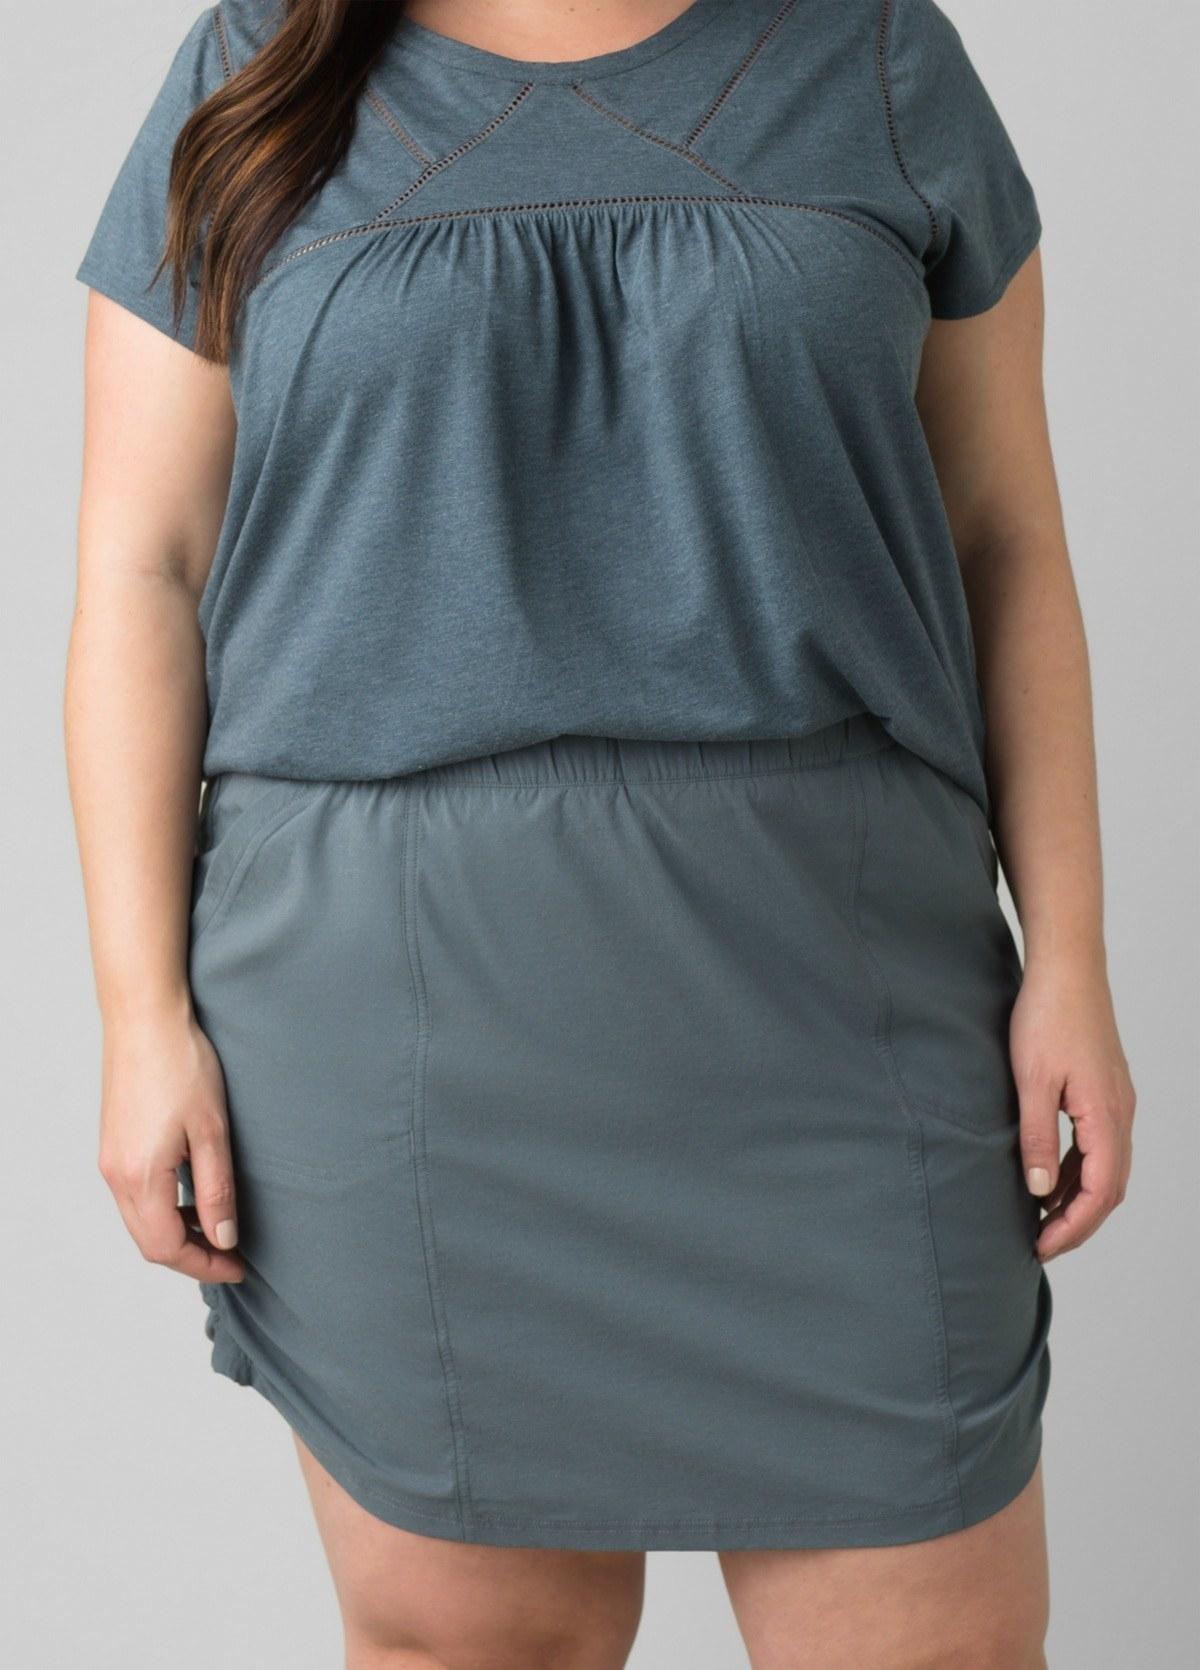 model in greyish blue mid-thigh length skort with an elastic waistband